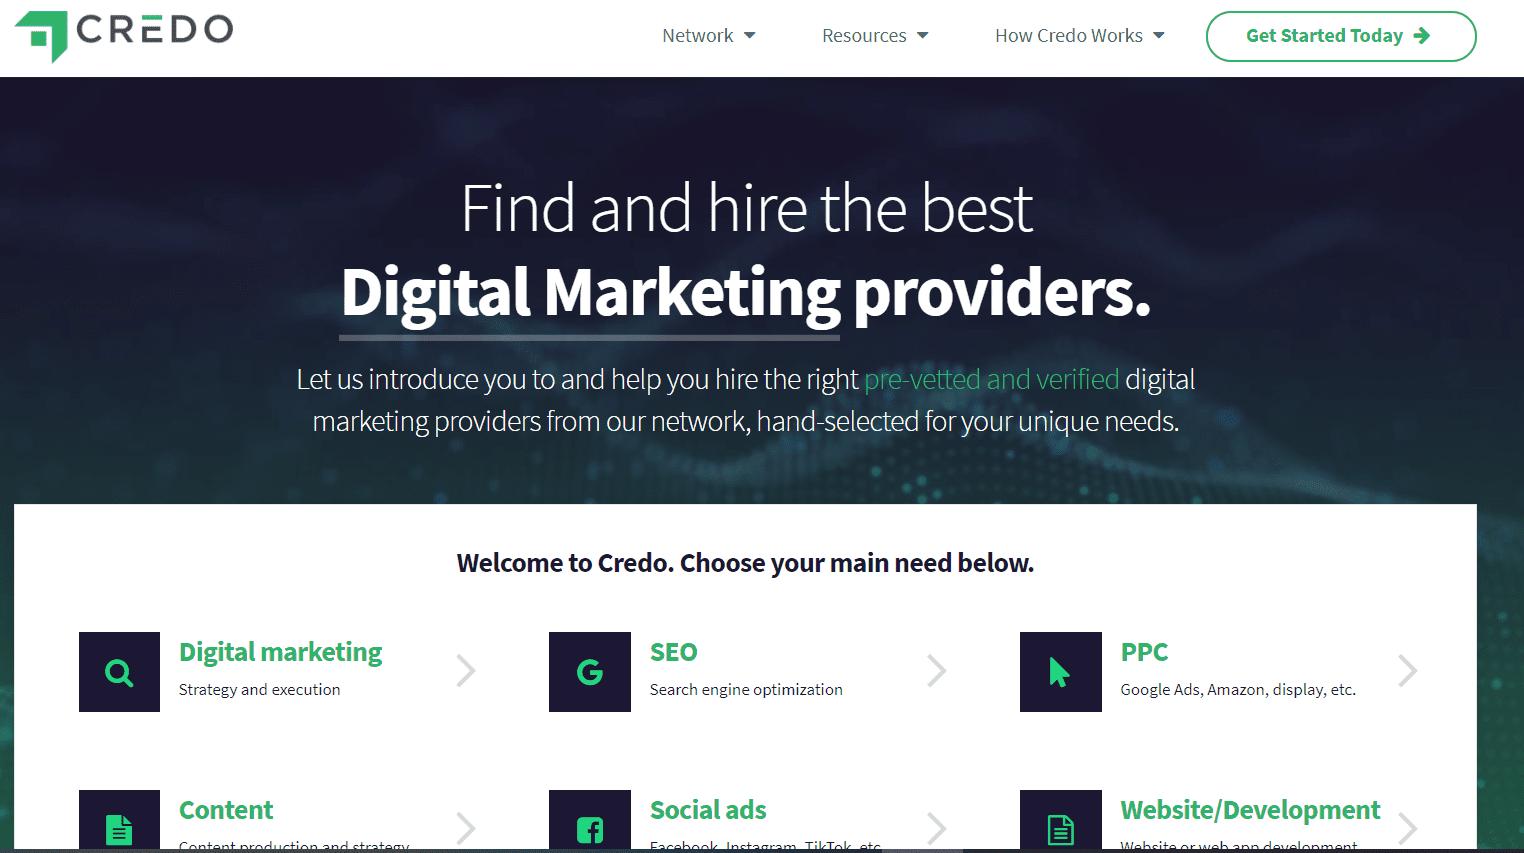 Credo Home Page